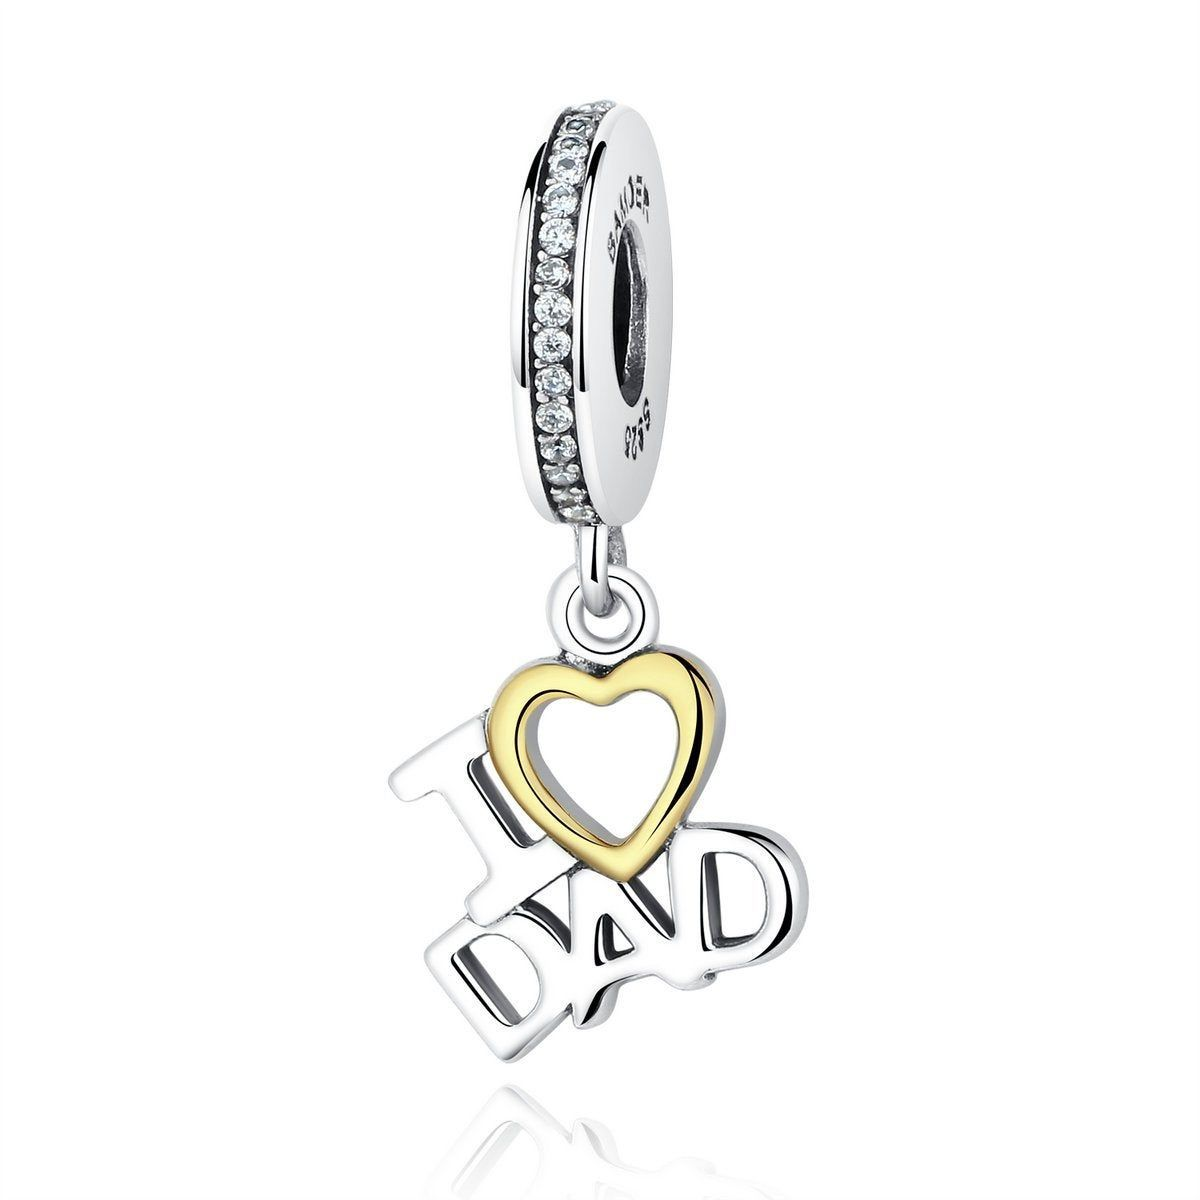 Genuine 925 Sterling Silver Mom Heart Charm Bead Bracelet Fit Mother//Mum